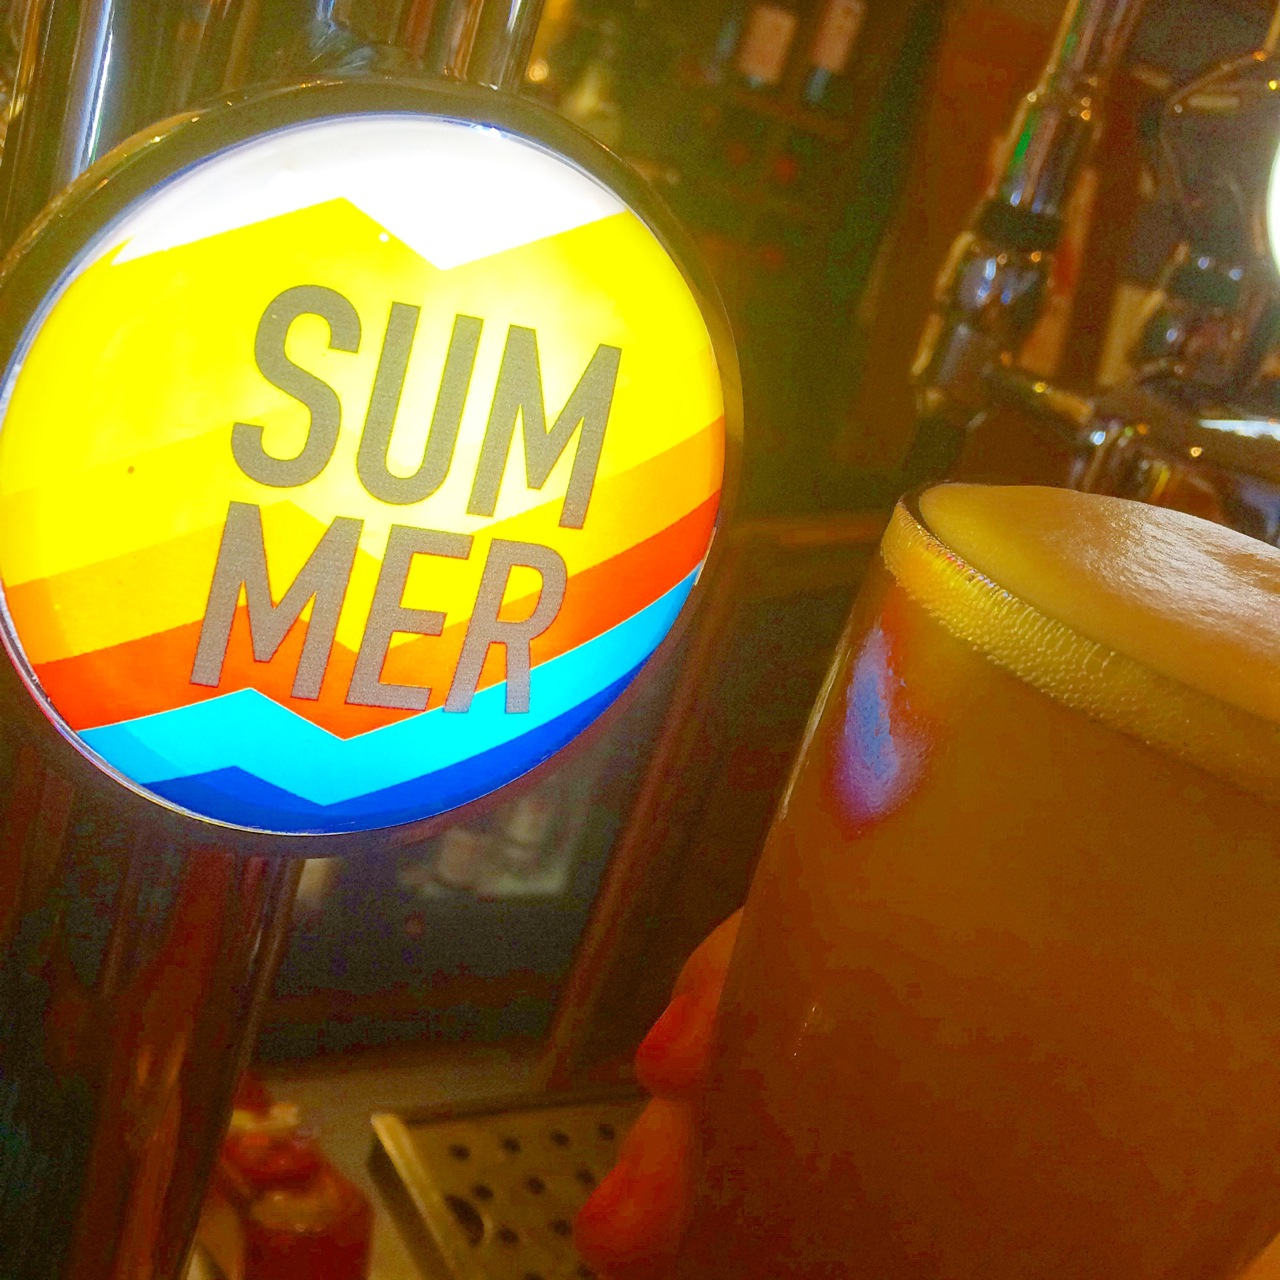 http://i2.wp.com/fatgayvegan.com/wp-content/uploads/2015/07/summer-beer-and-union.jpg?fit=1280%2C1280